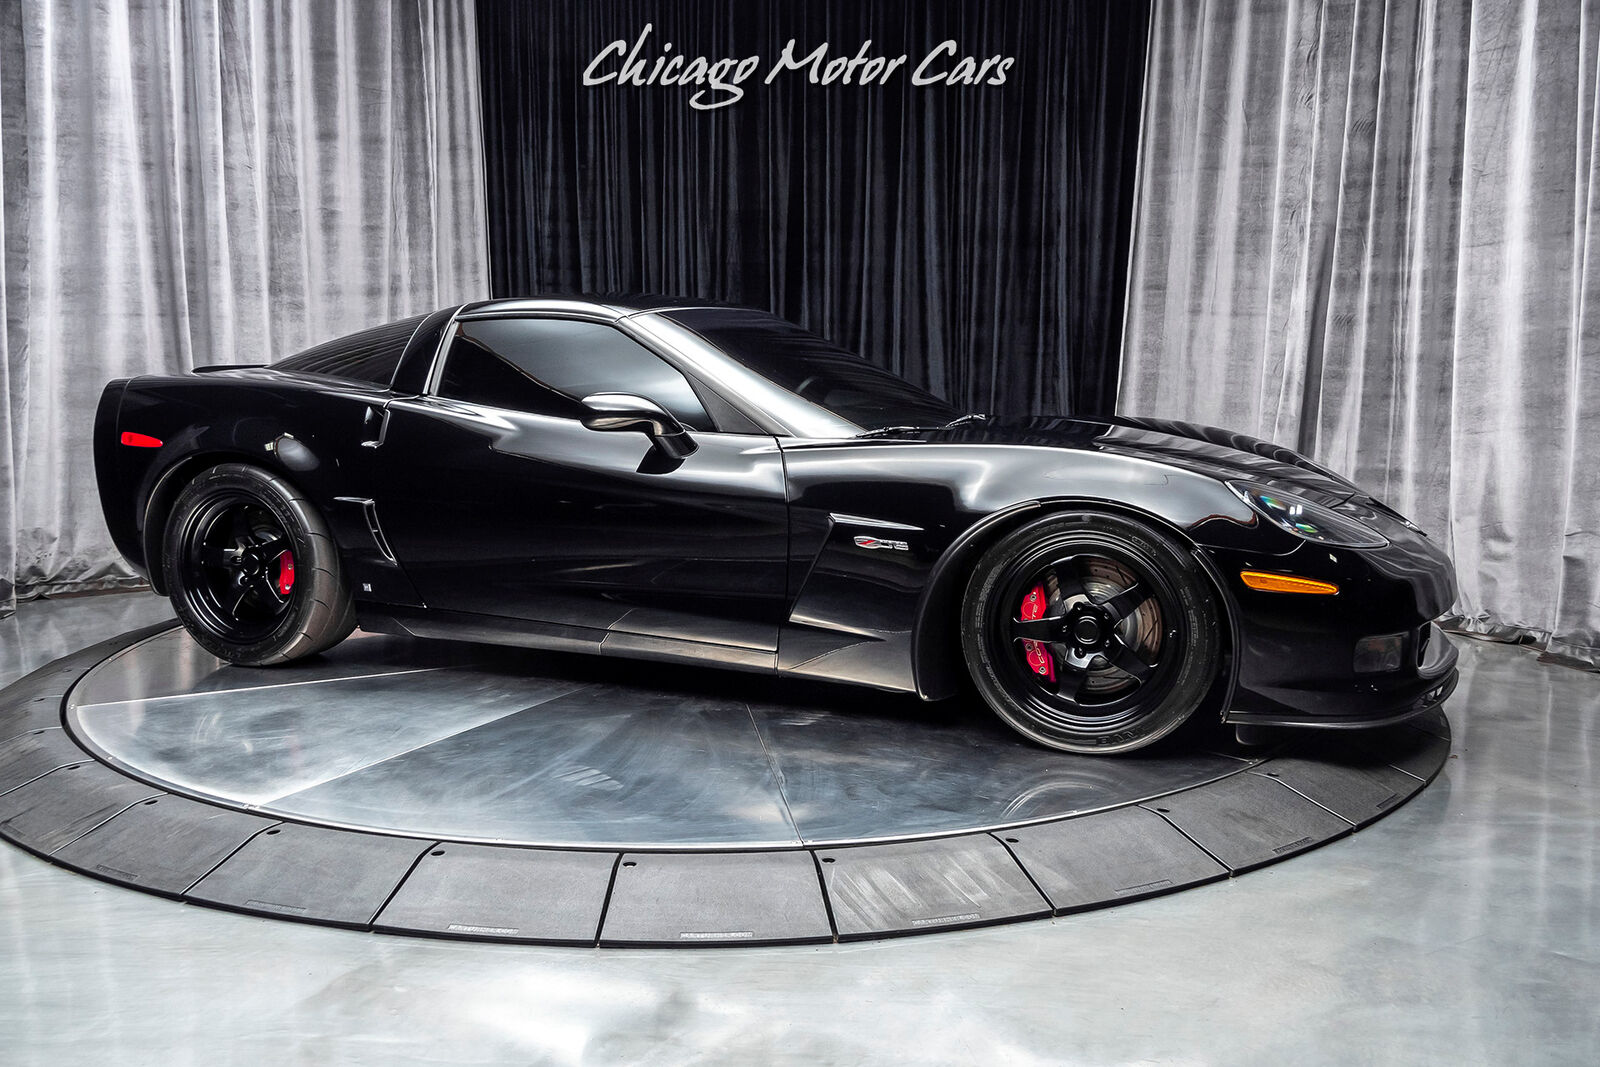 2008 Black Chevrolet Corvette Z06 3LZ | C6 Corvette Photo 6